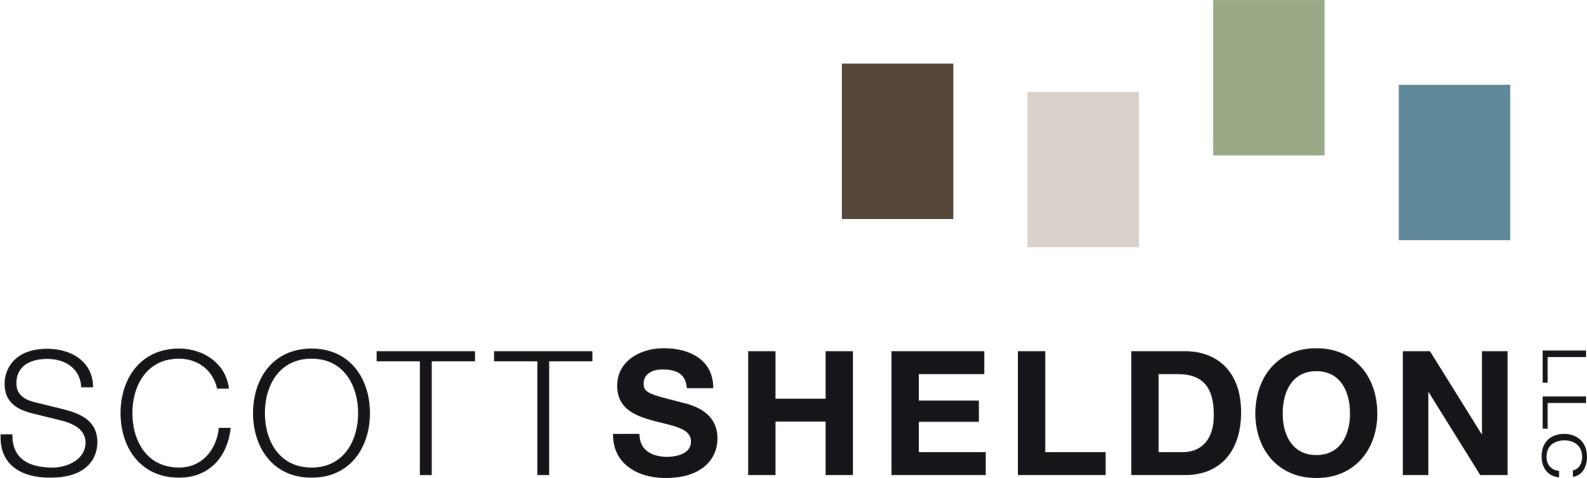 Scott Sheldon_Logo-cropped.jpg